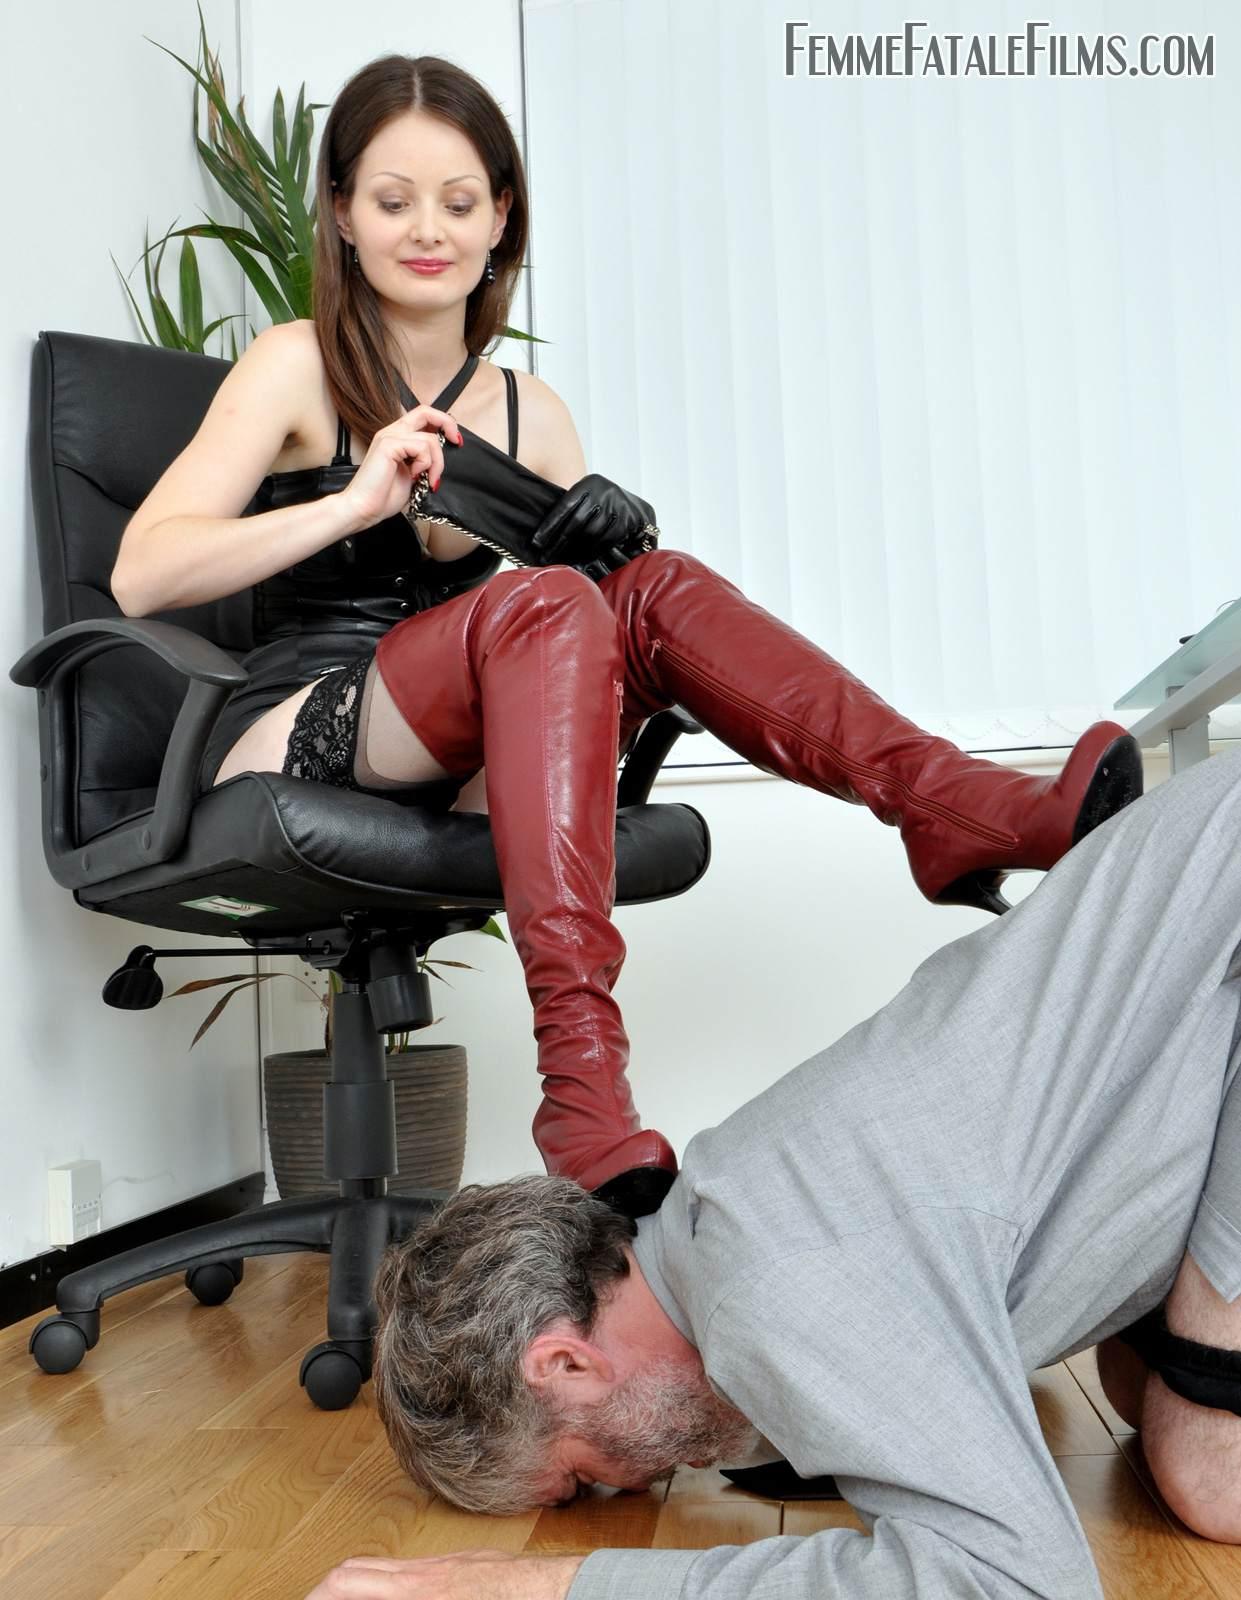 Olga kurylenko nude pic